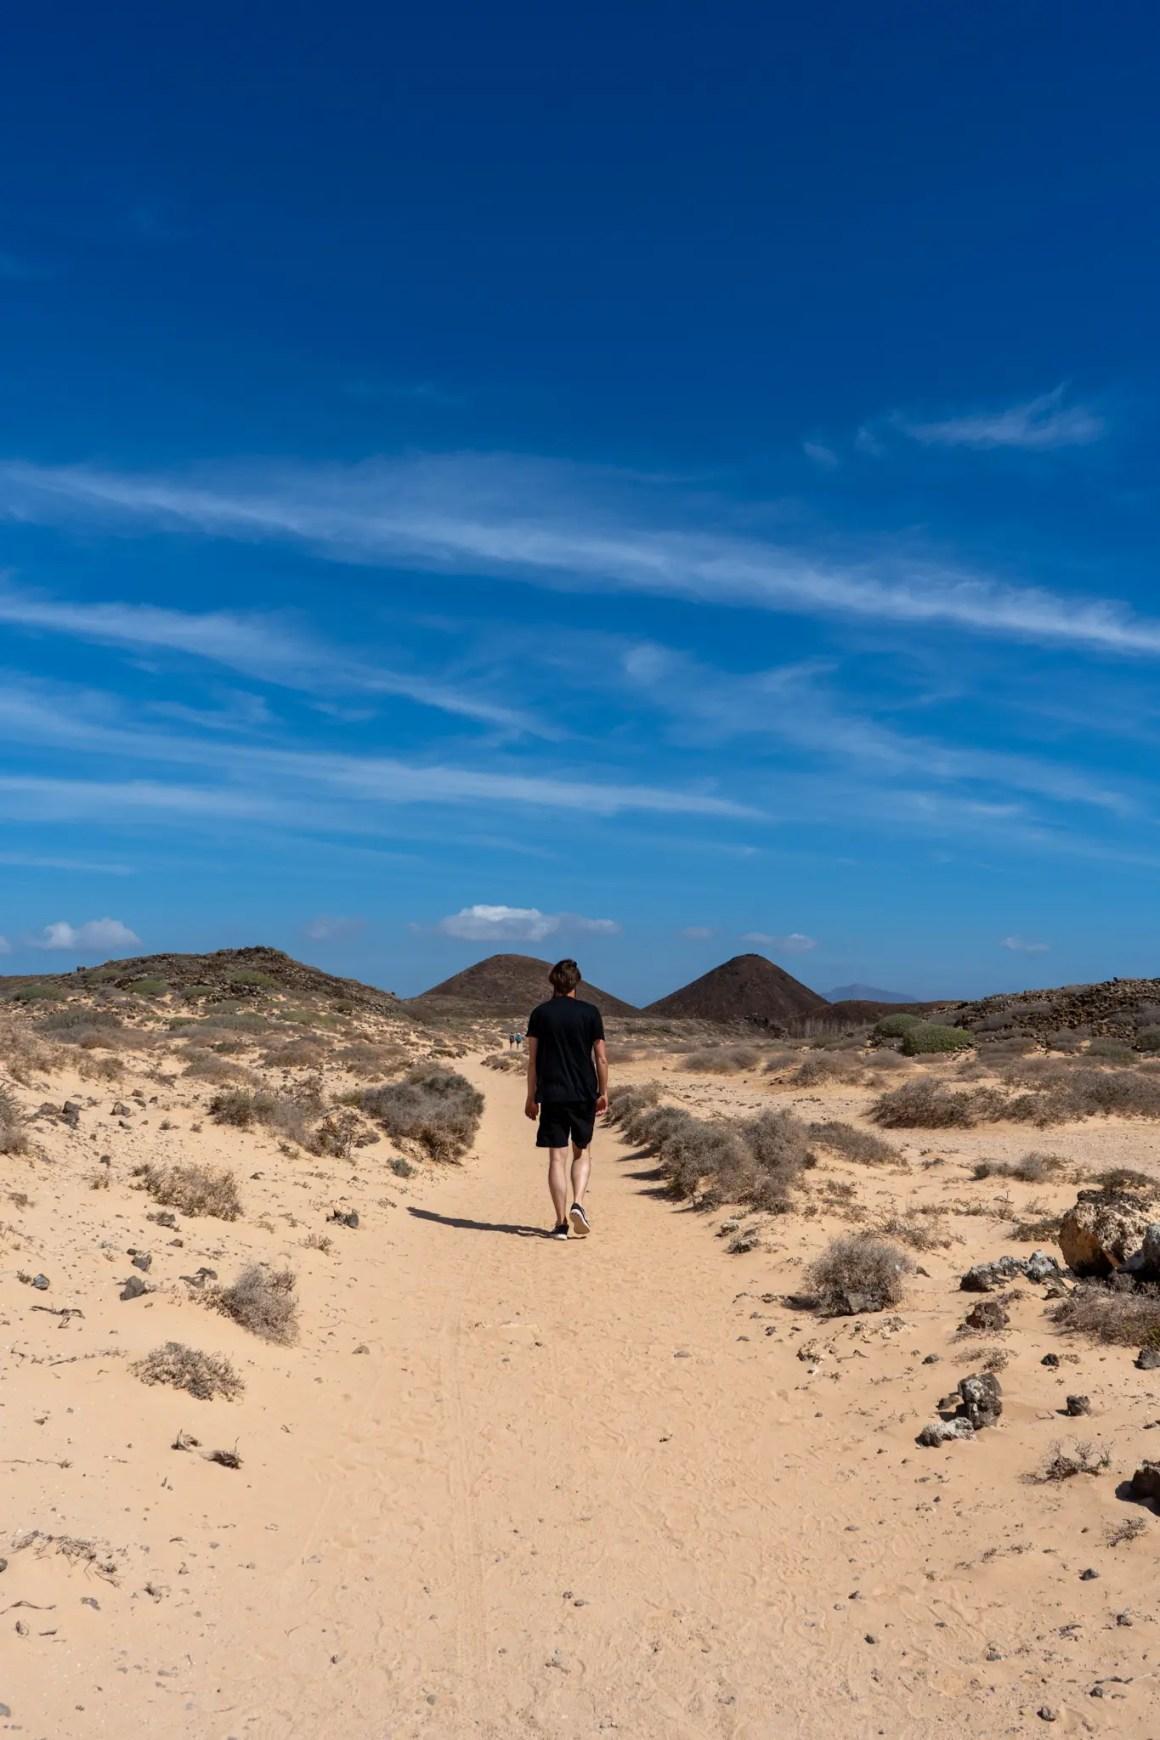 Zandpad op het eiland Lobos